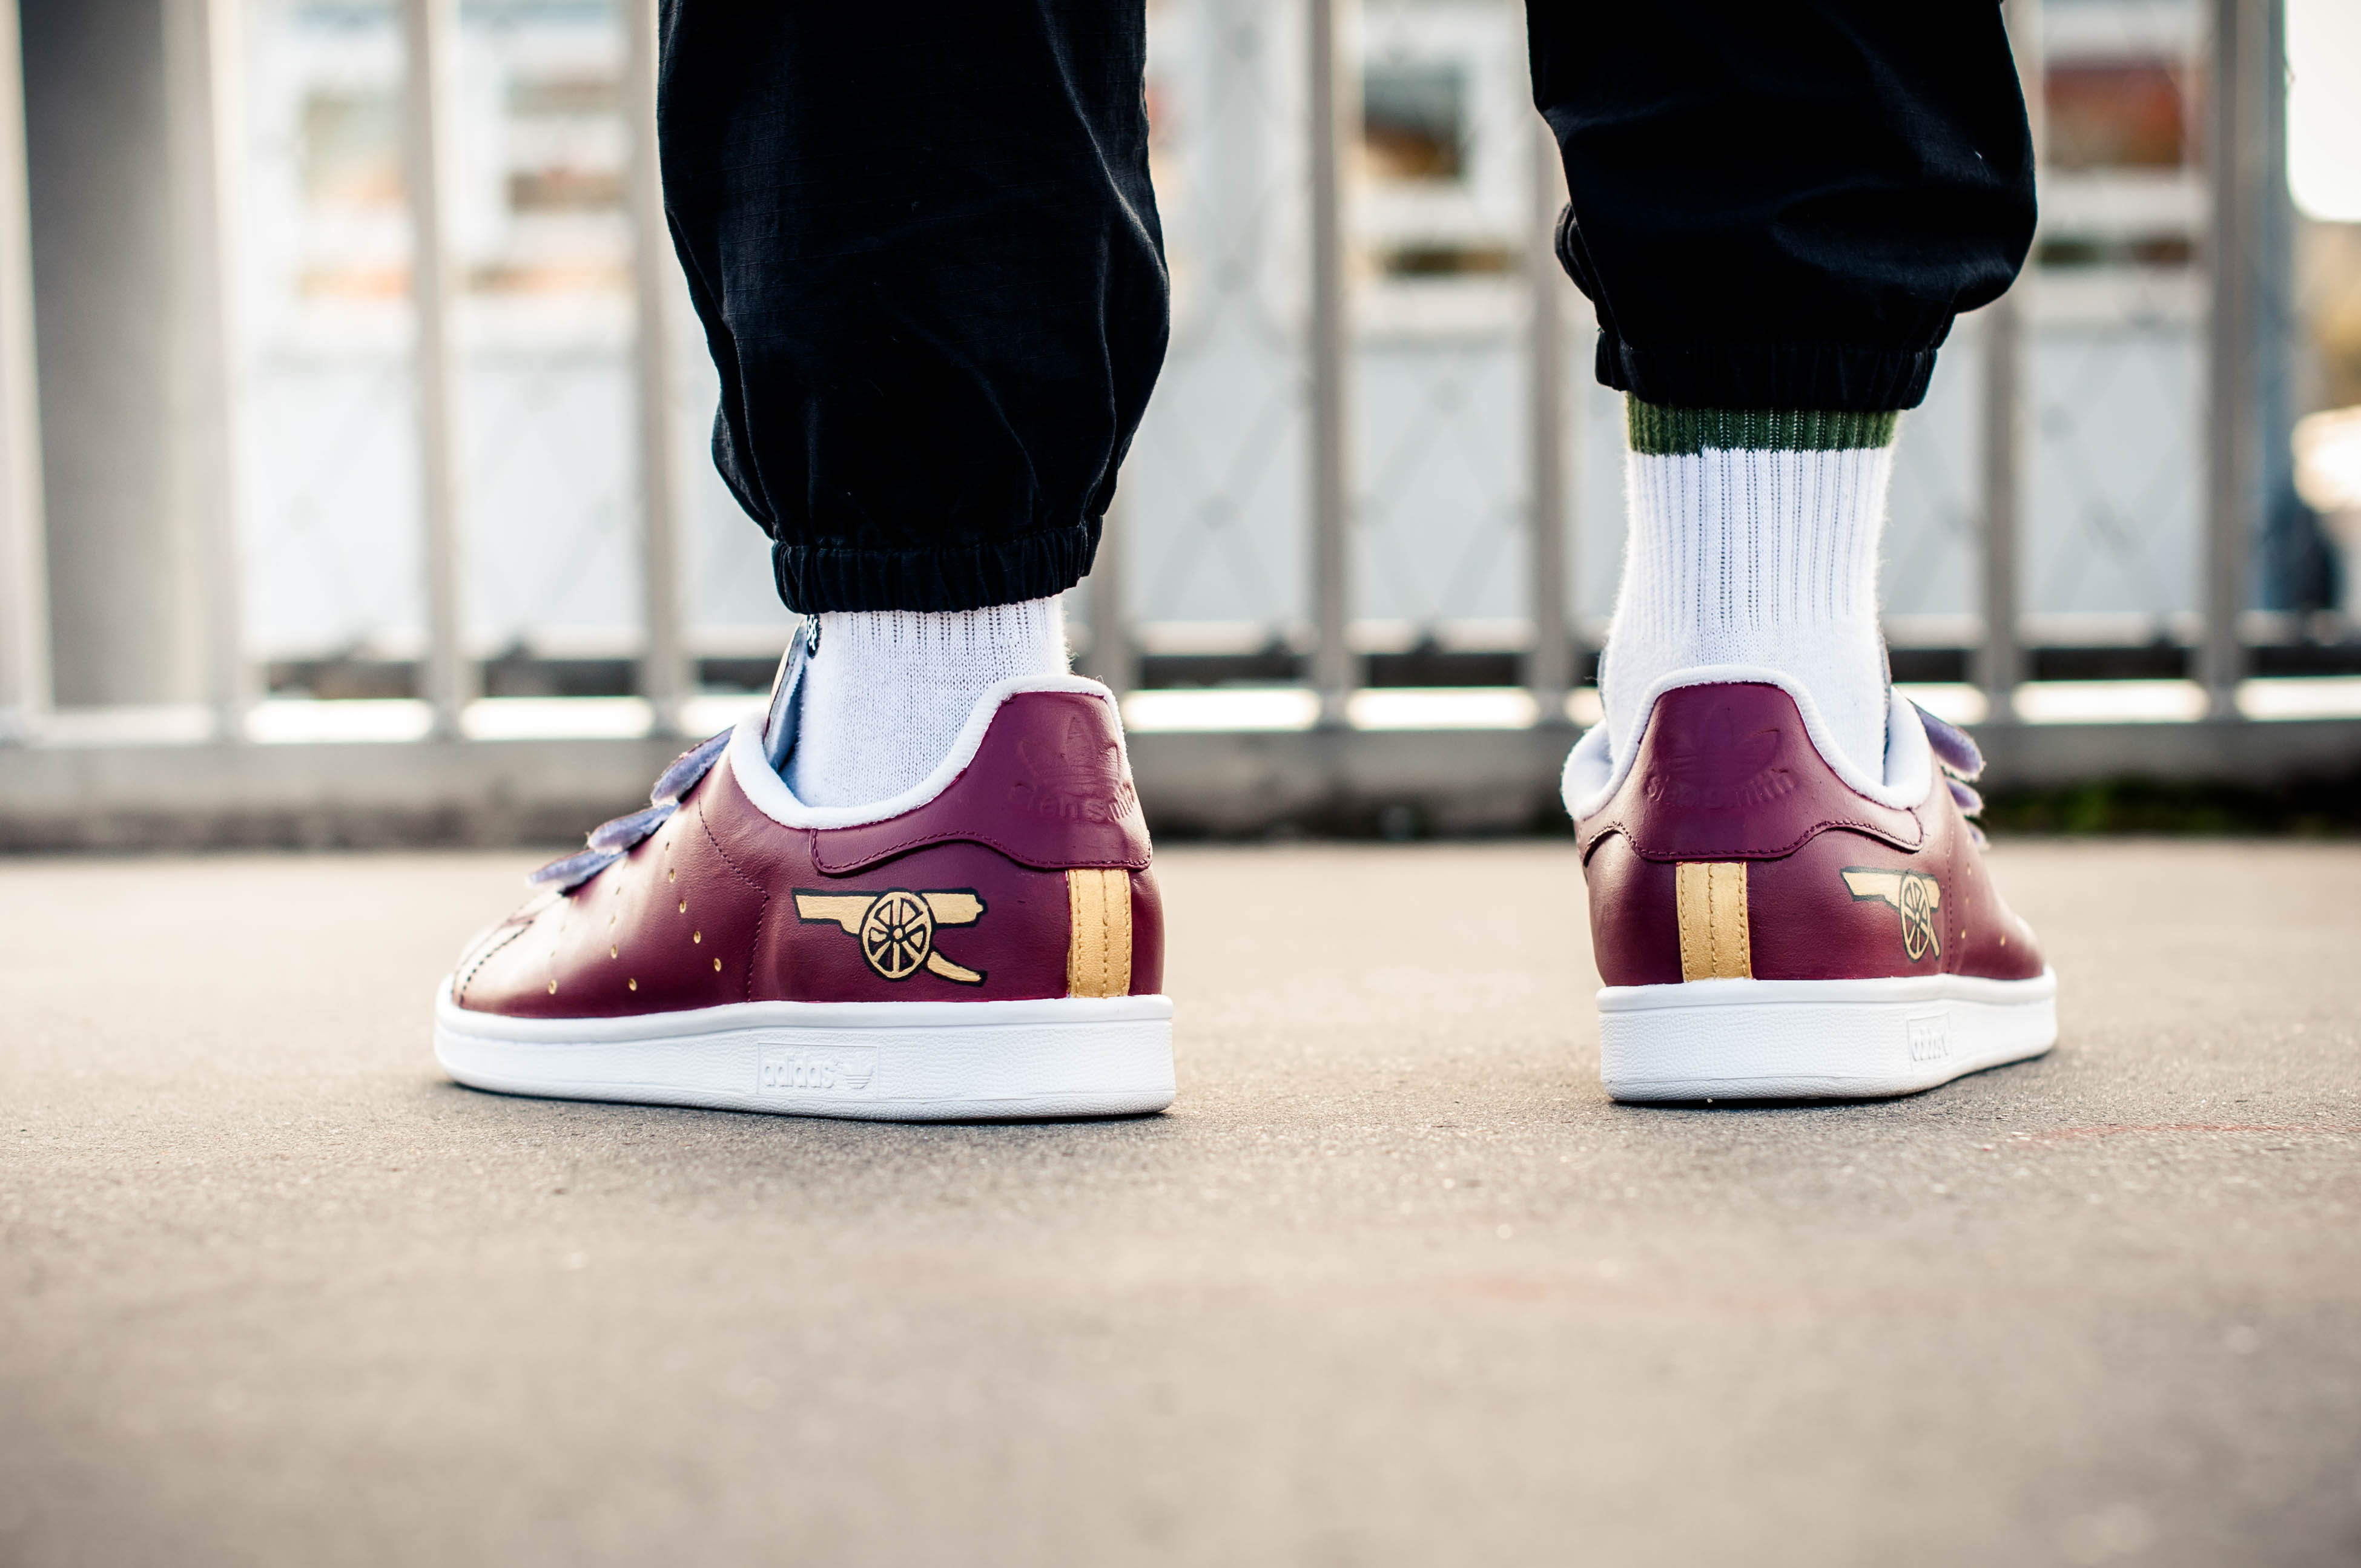 inflammable-x-sneakerskills-fc-arsenal-london-costum-gewinnspiel-10